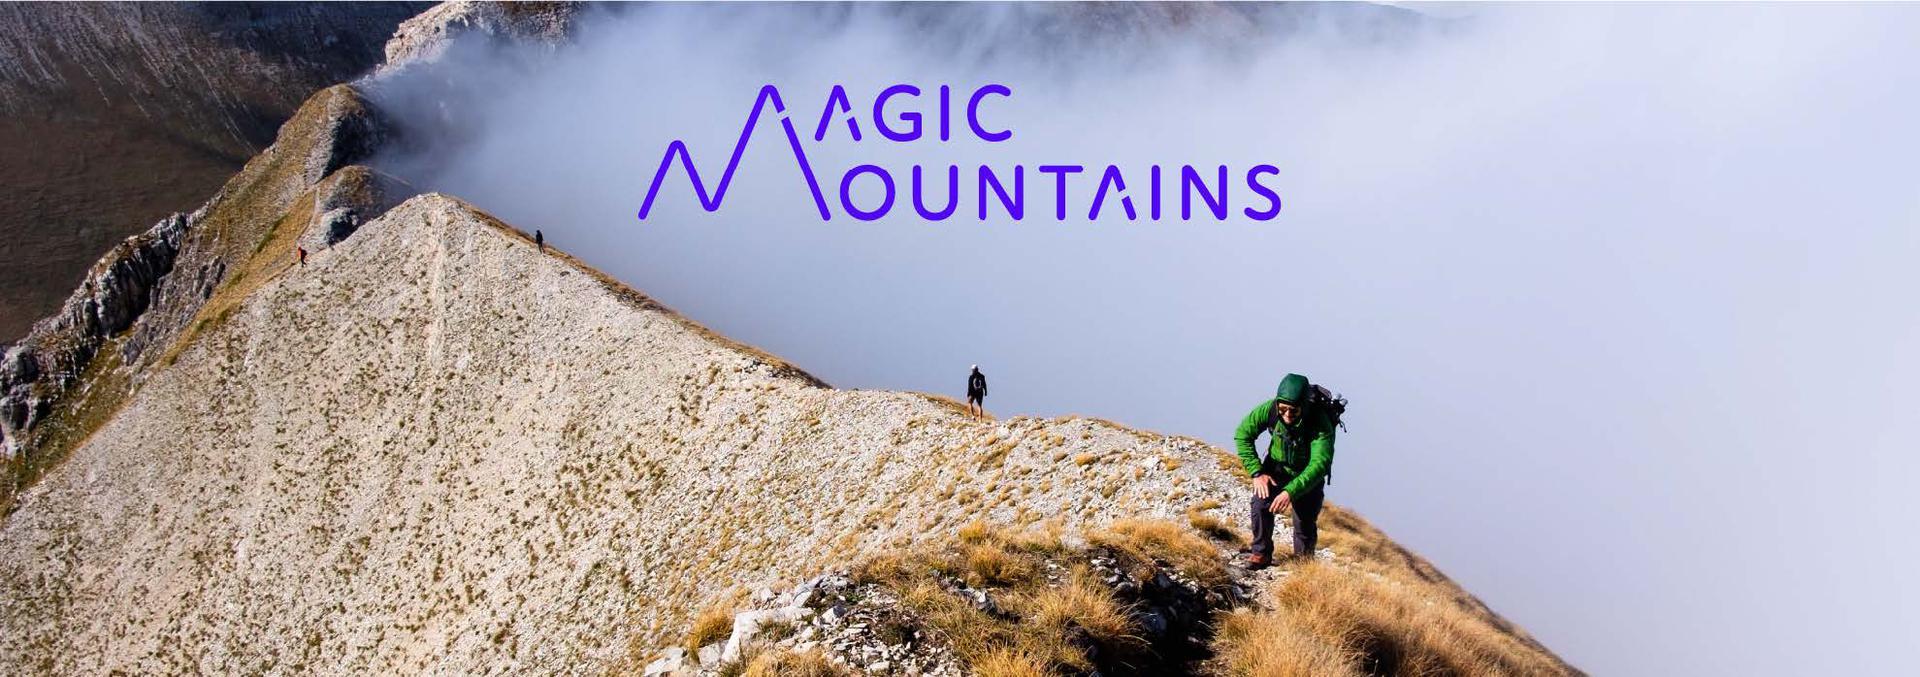 MAGIC MOUNTAINS DOCUMENTARY